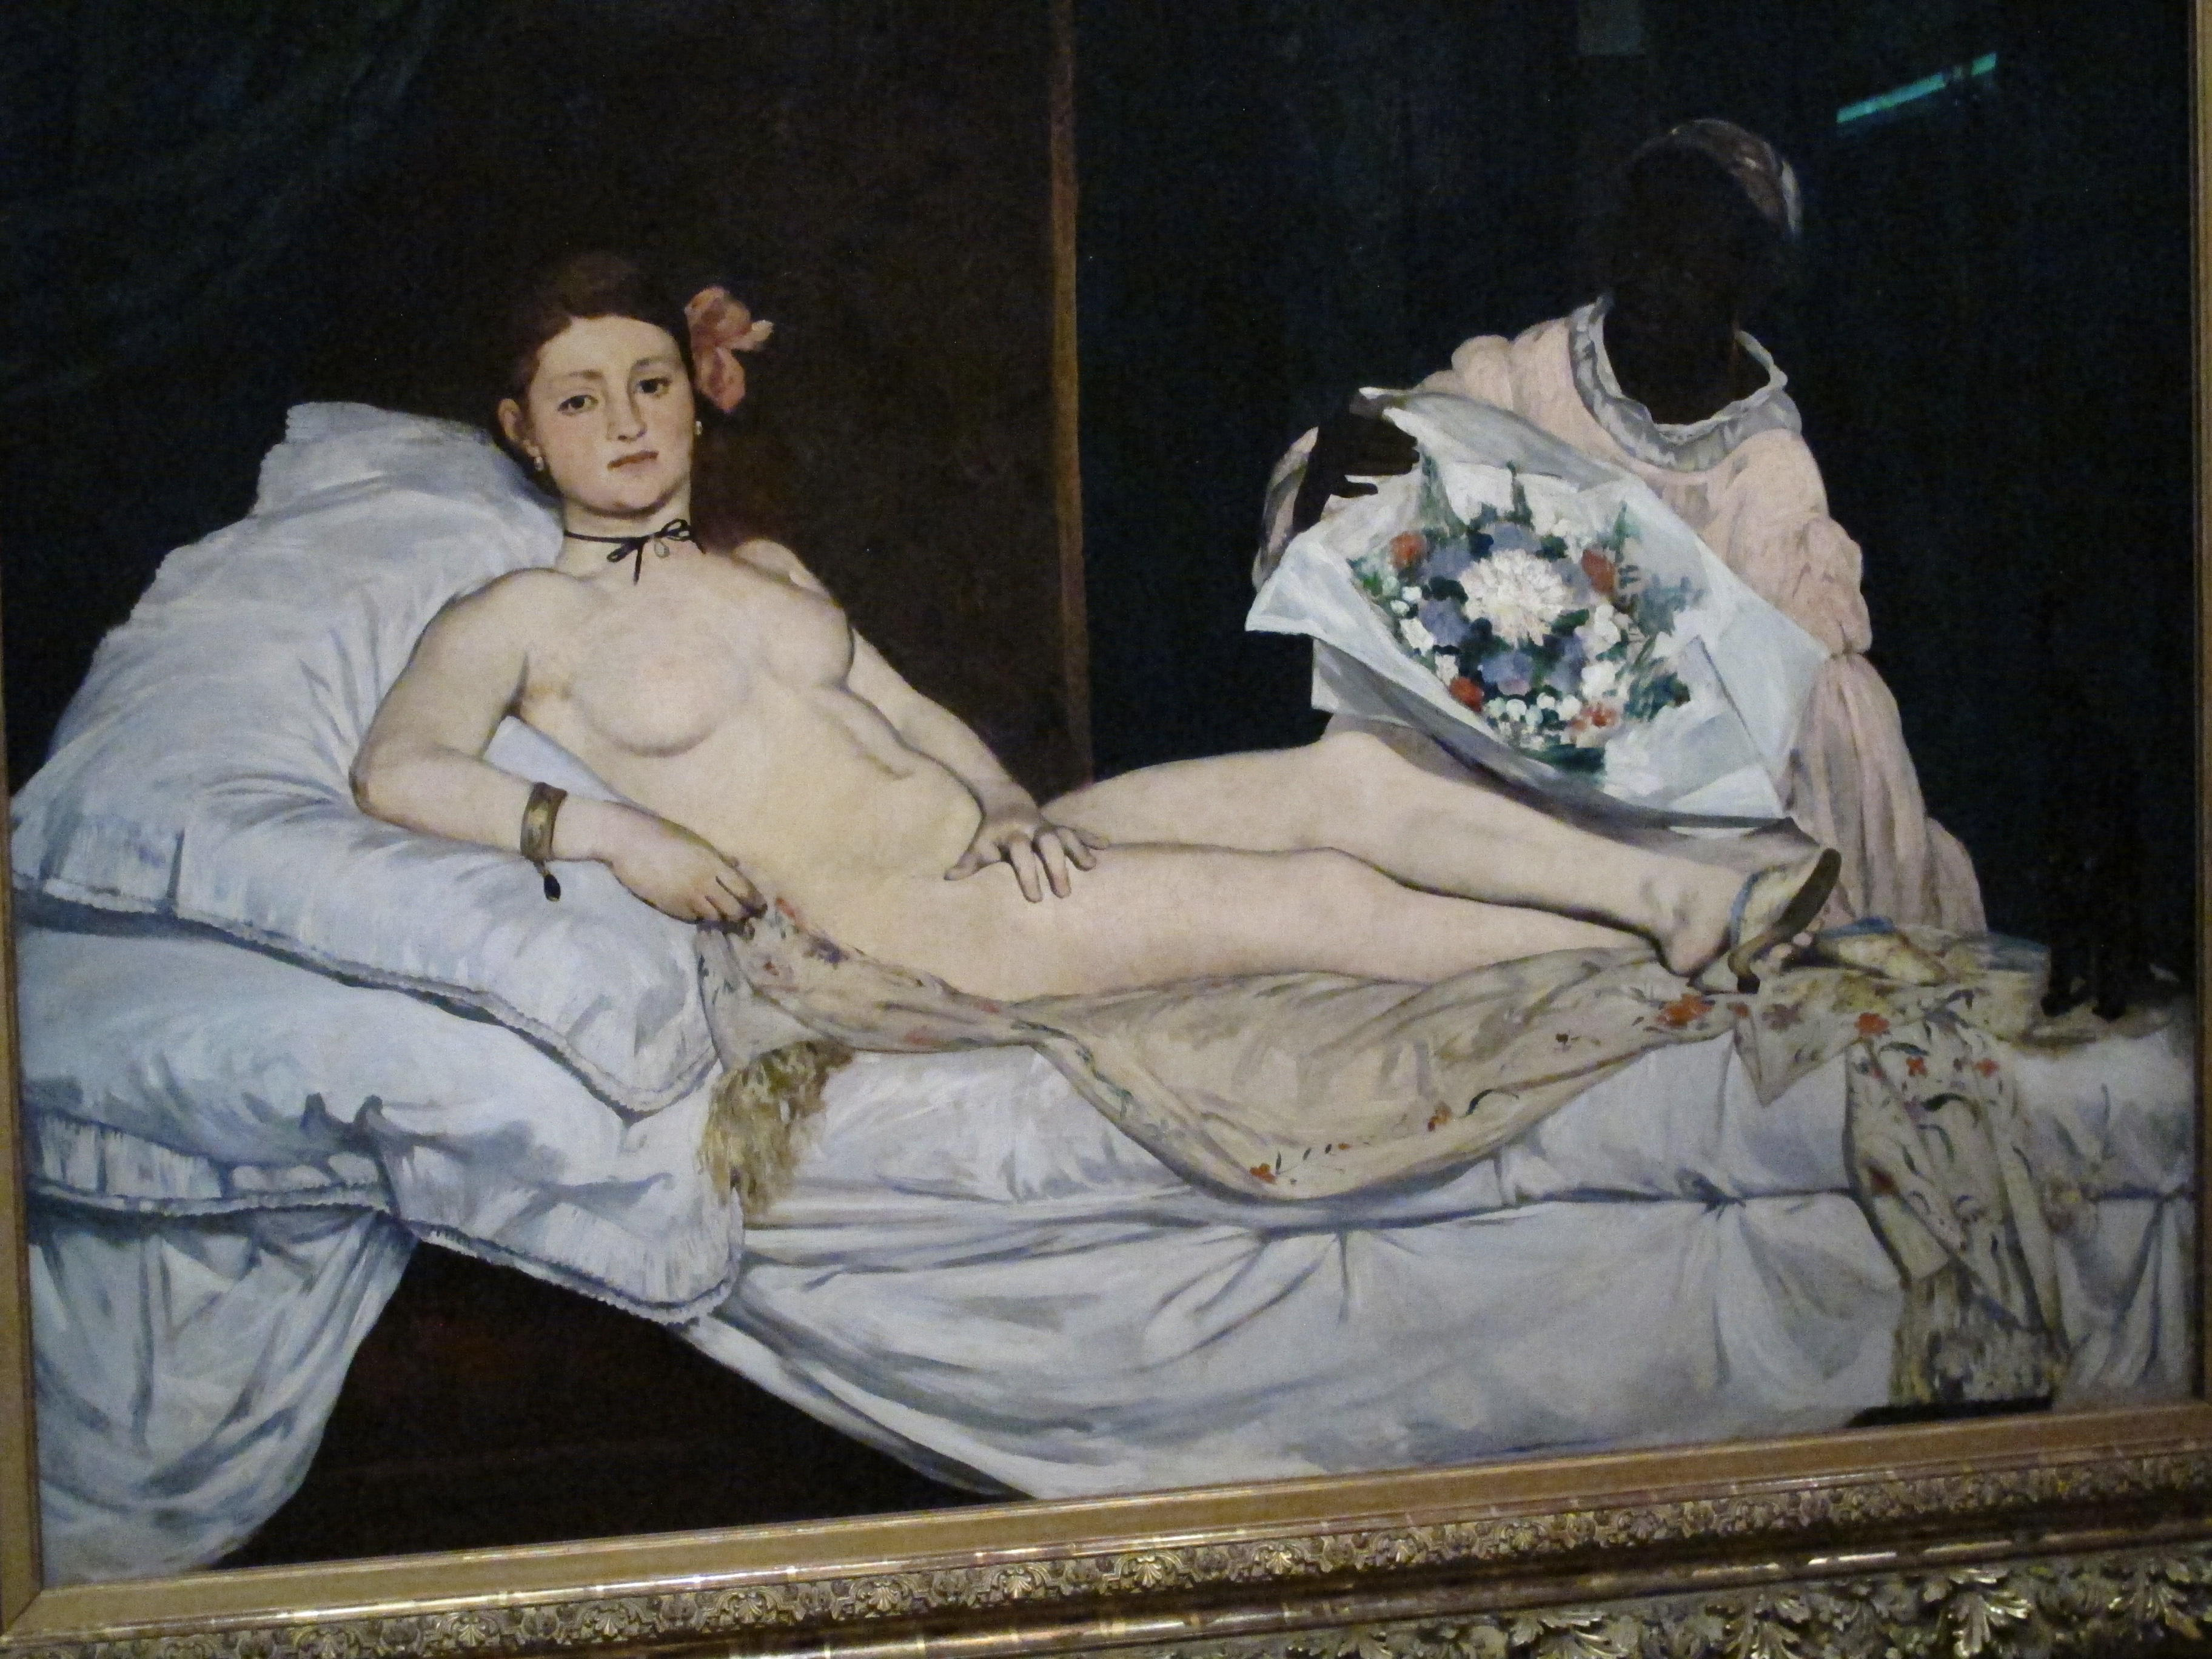 800px-manet,edouard-olympia,1863 шедевры